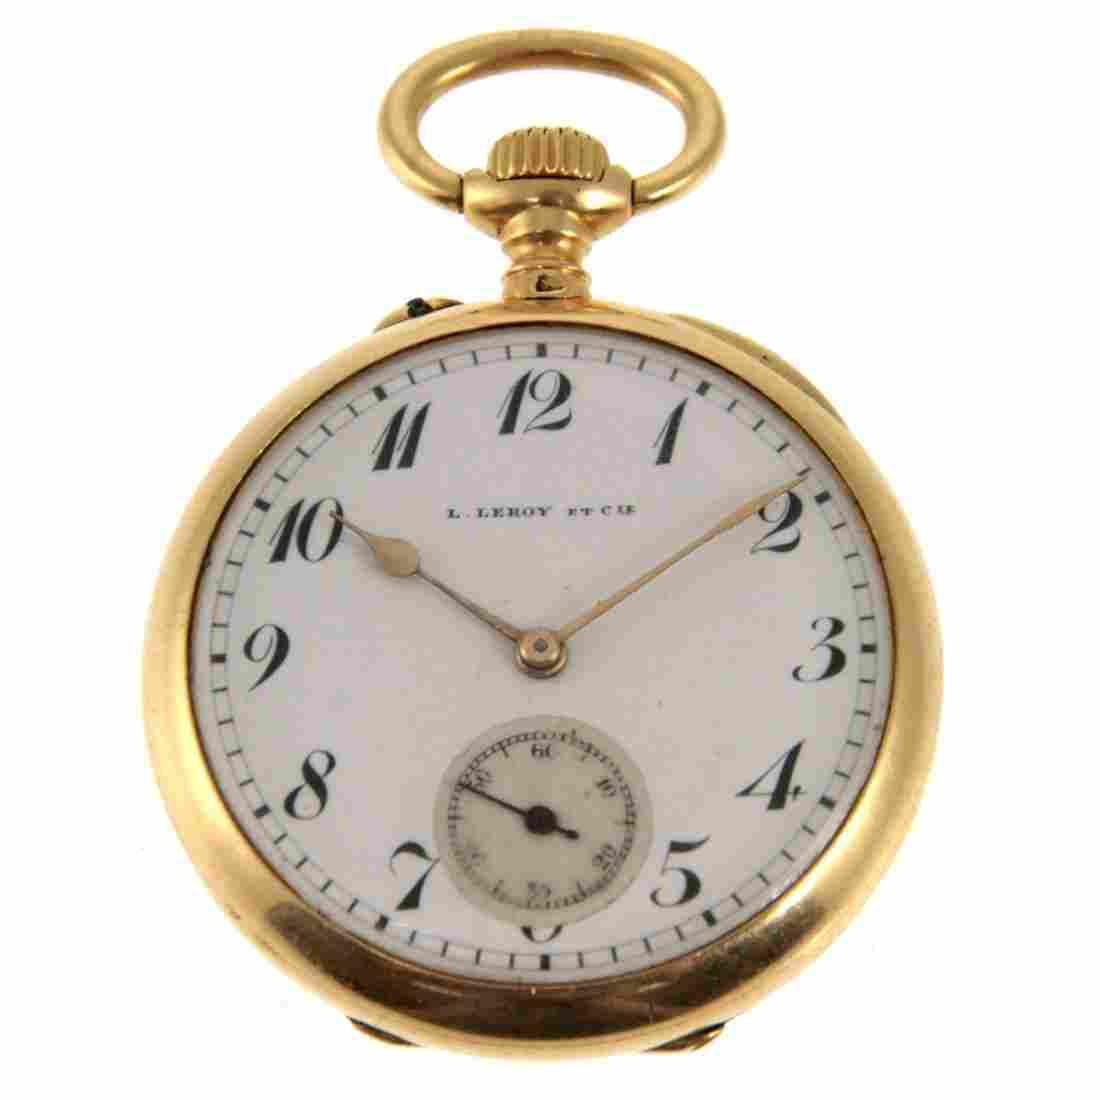 L. Leroy & Cie 18k Gold Open Face Pocket Watch.